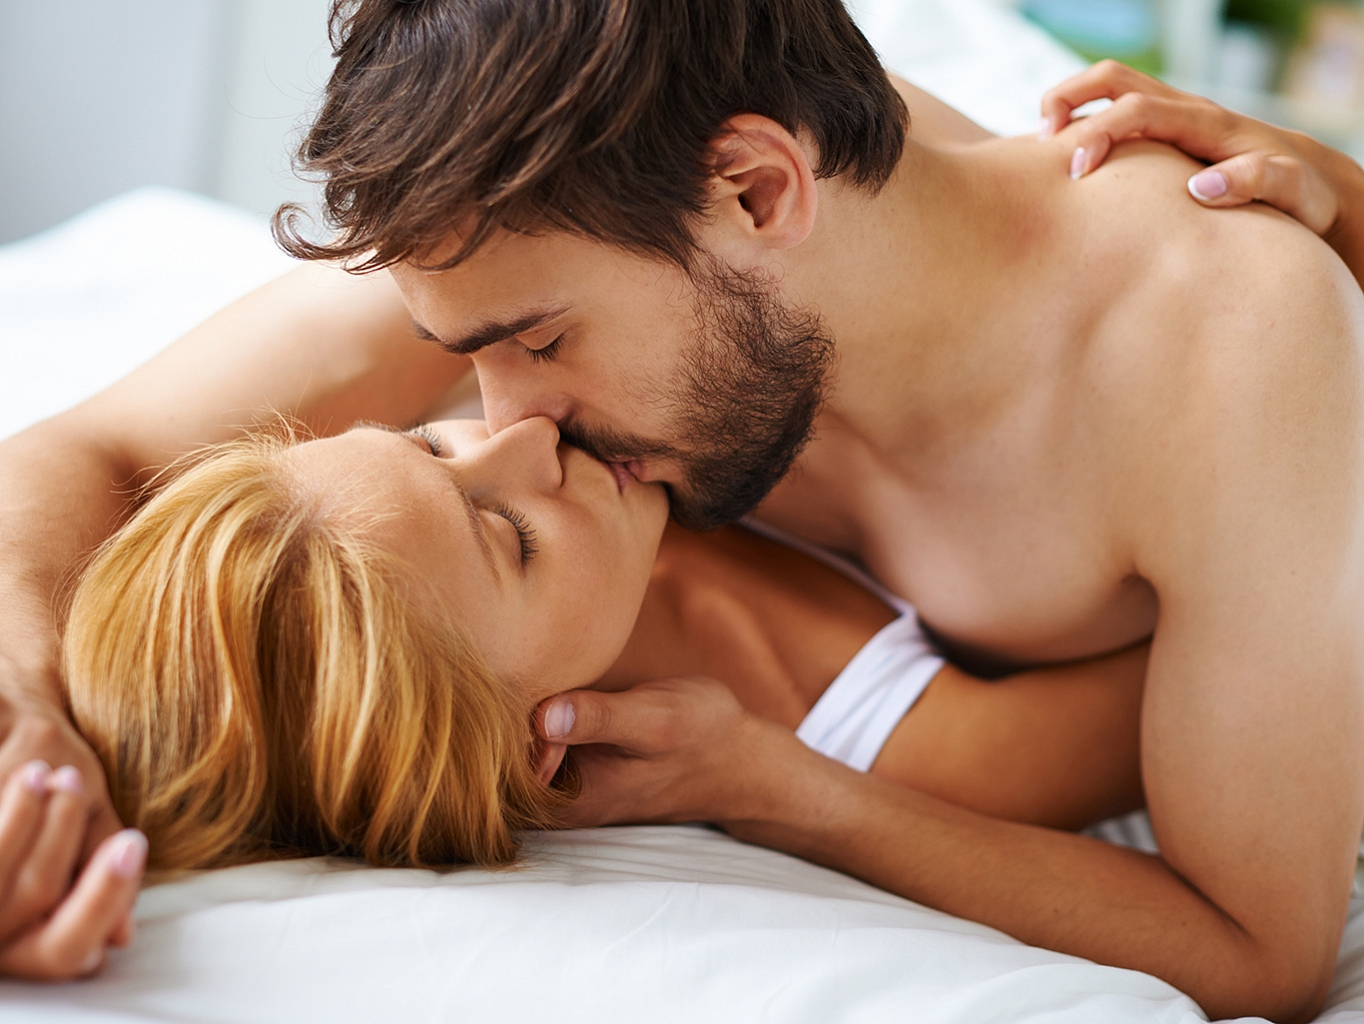 Love sex and lies